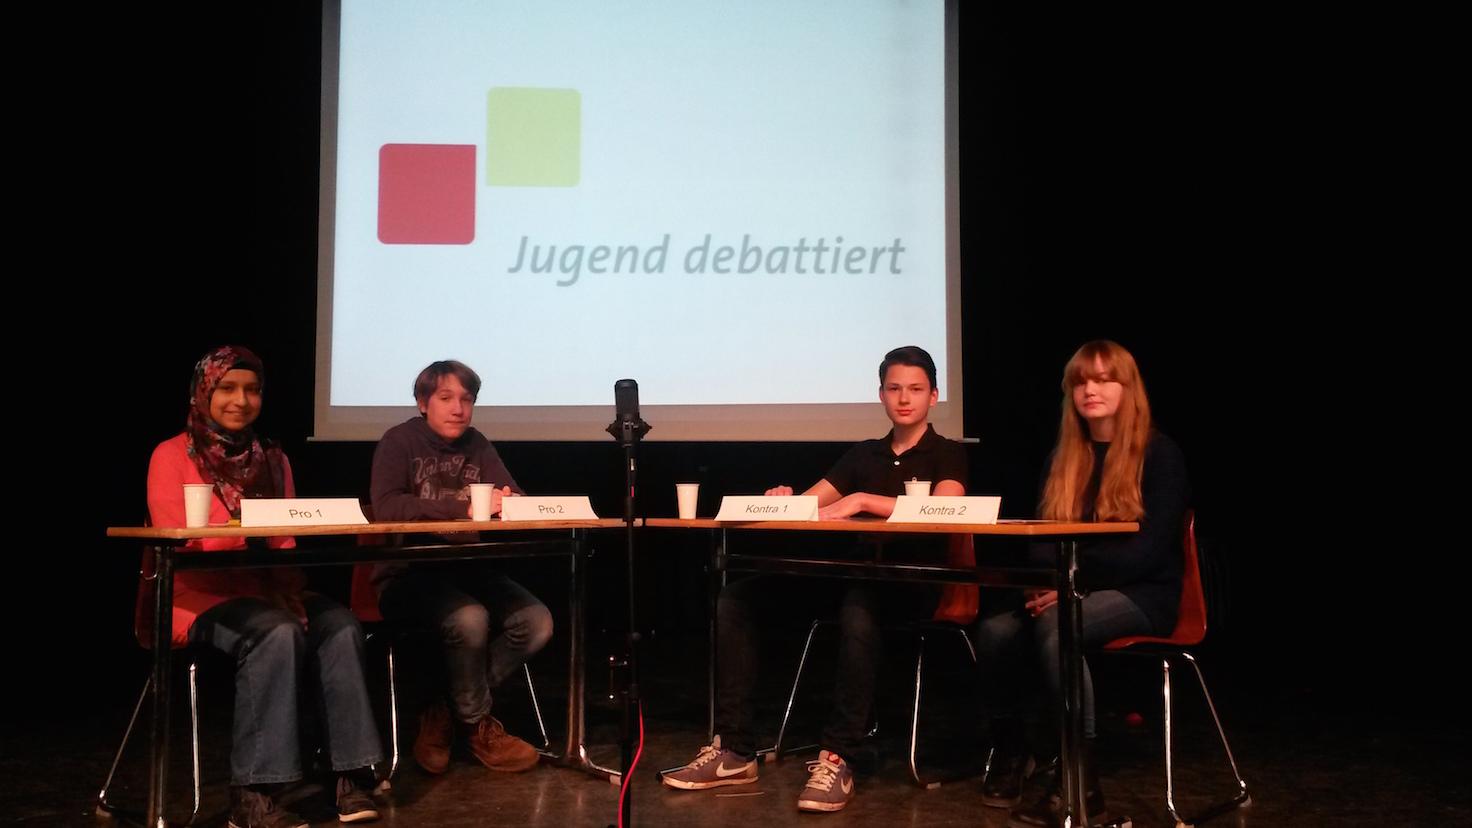 2015_02_Jugend debattiert